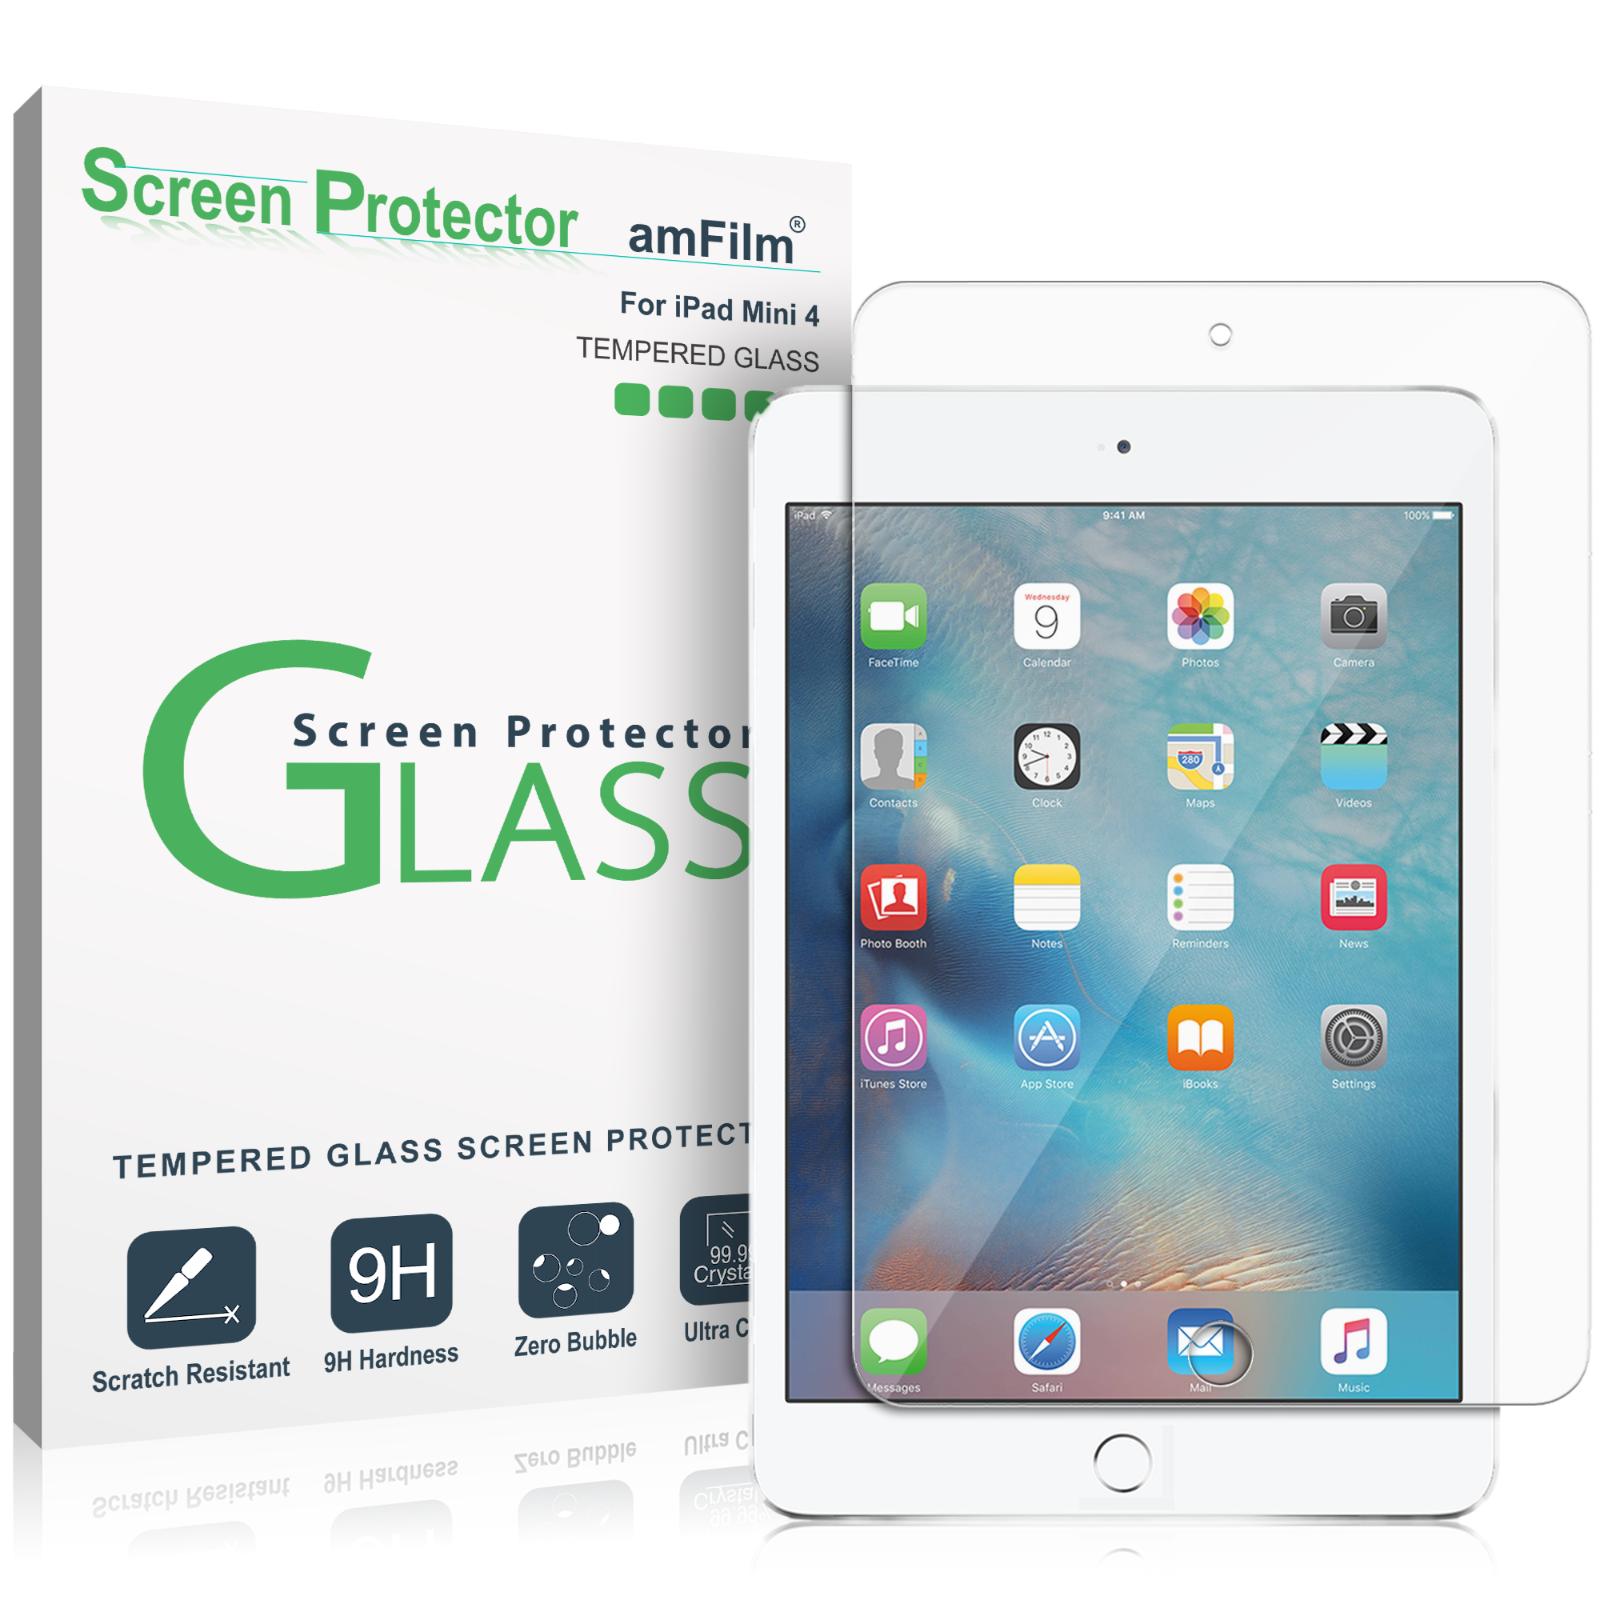 apple ipad mini 4 premium tempered glass screen protector 1 pack rh ebay com iPad iOS 5.1 Home Screen iPad Software Update